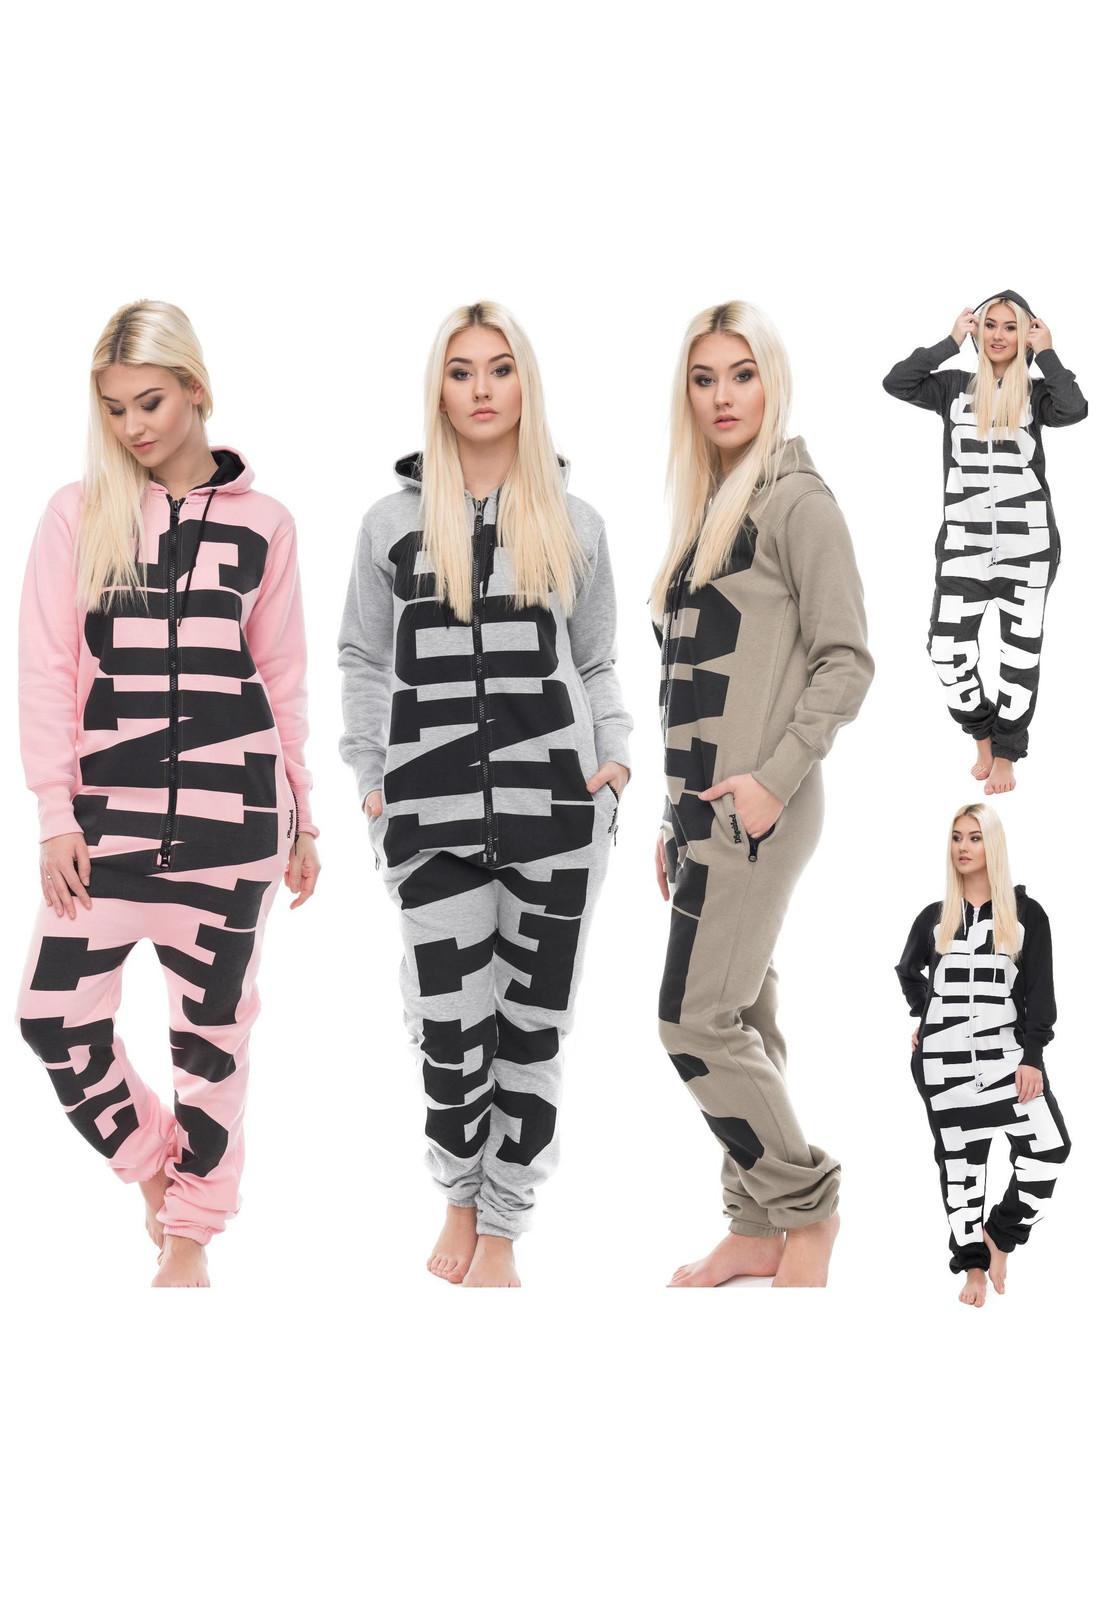 4cab16e6f93a3a Jumpsuit Freizeitanzug Overall Pyjama mit Sonntag Schriftzug. Loomiloo